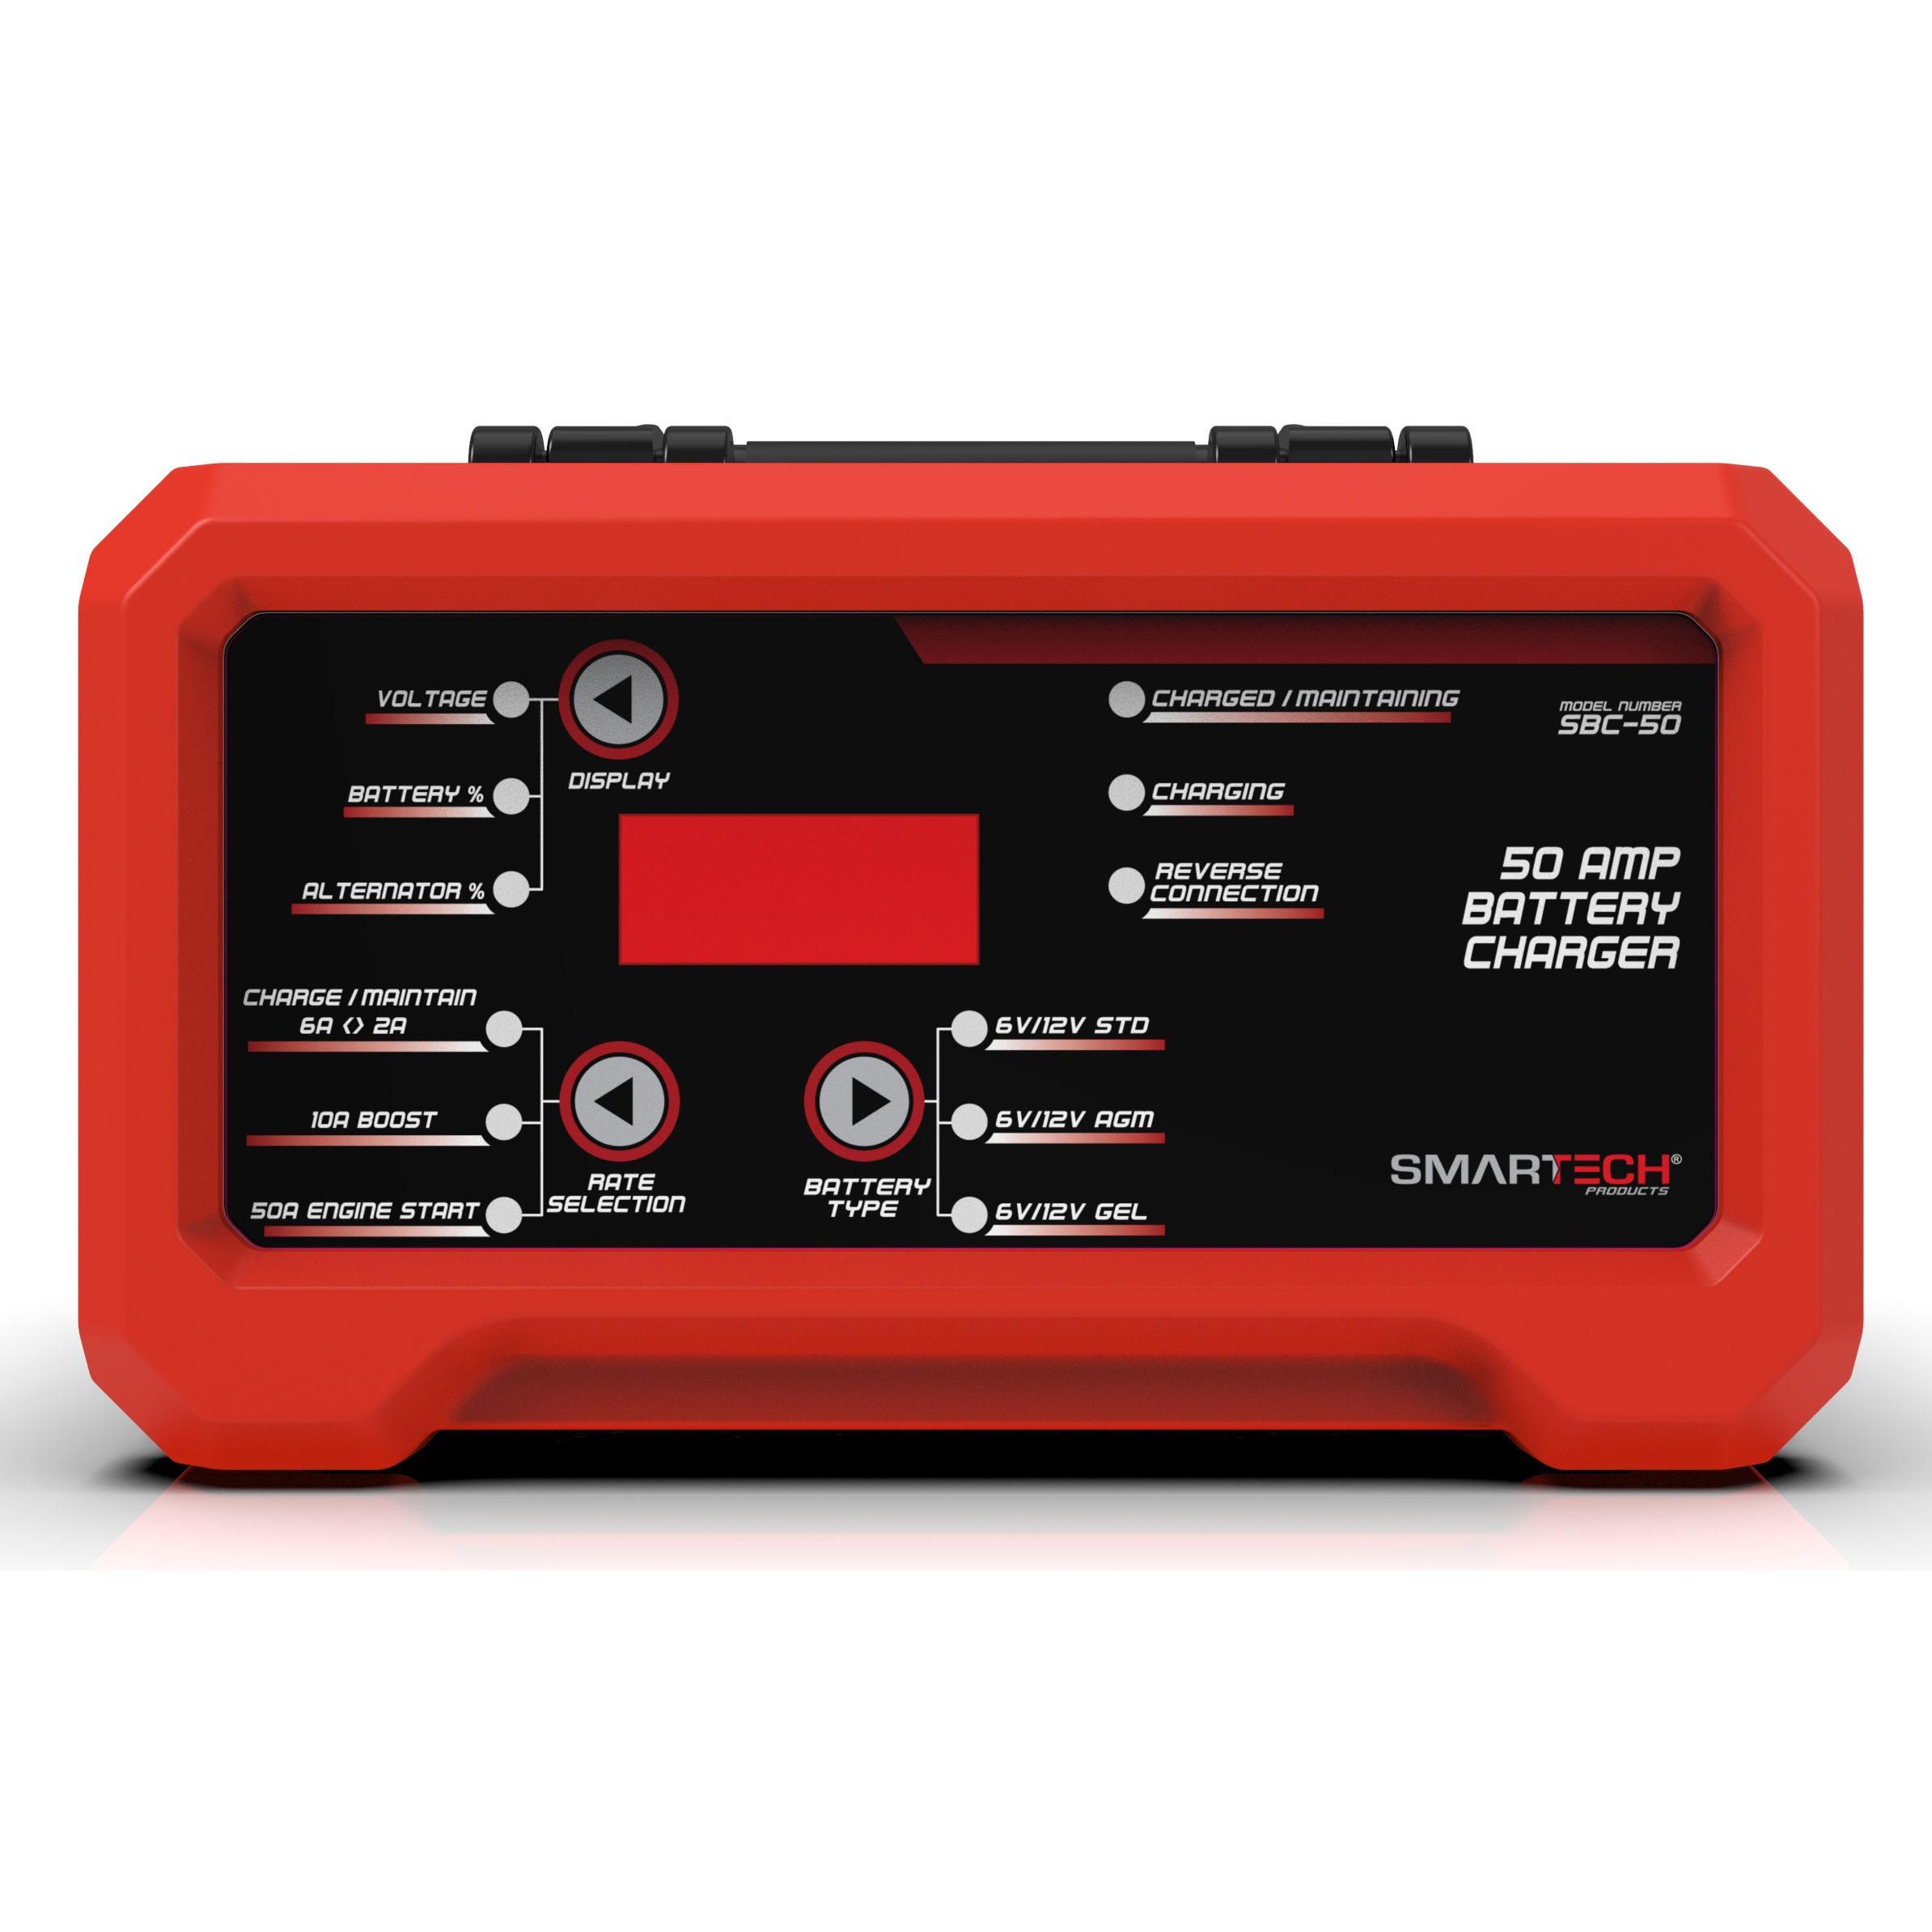 Smartech SBC-50 6V/12V Shelf Automotive Battery Charger, Maintainer